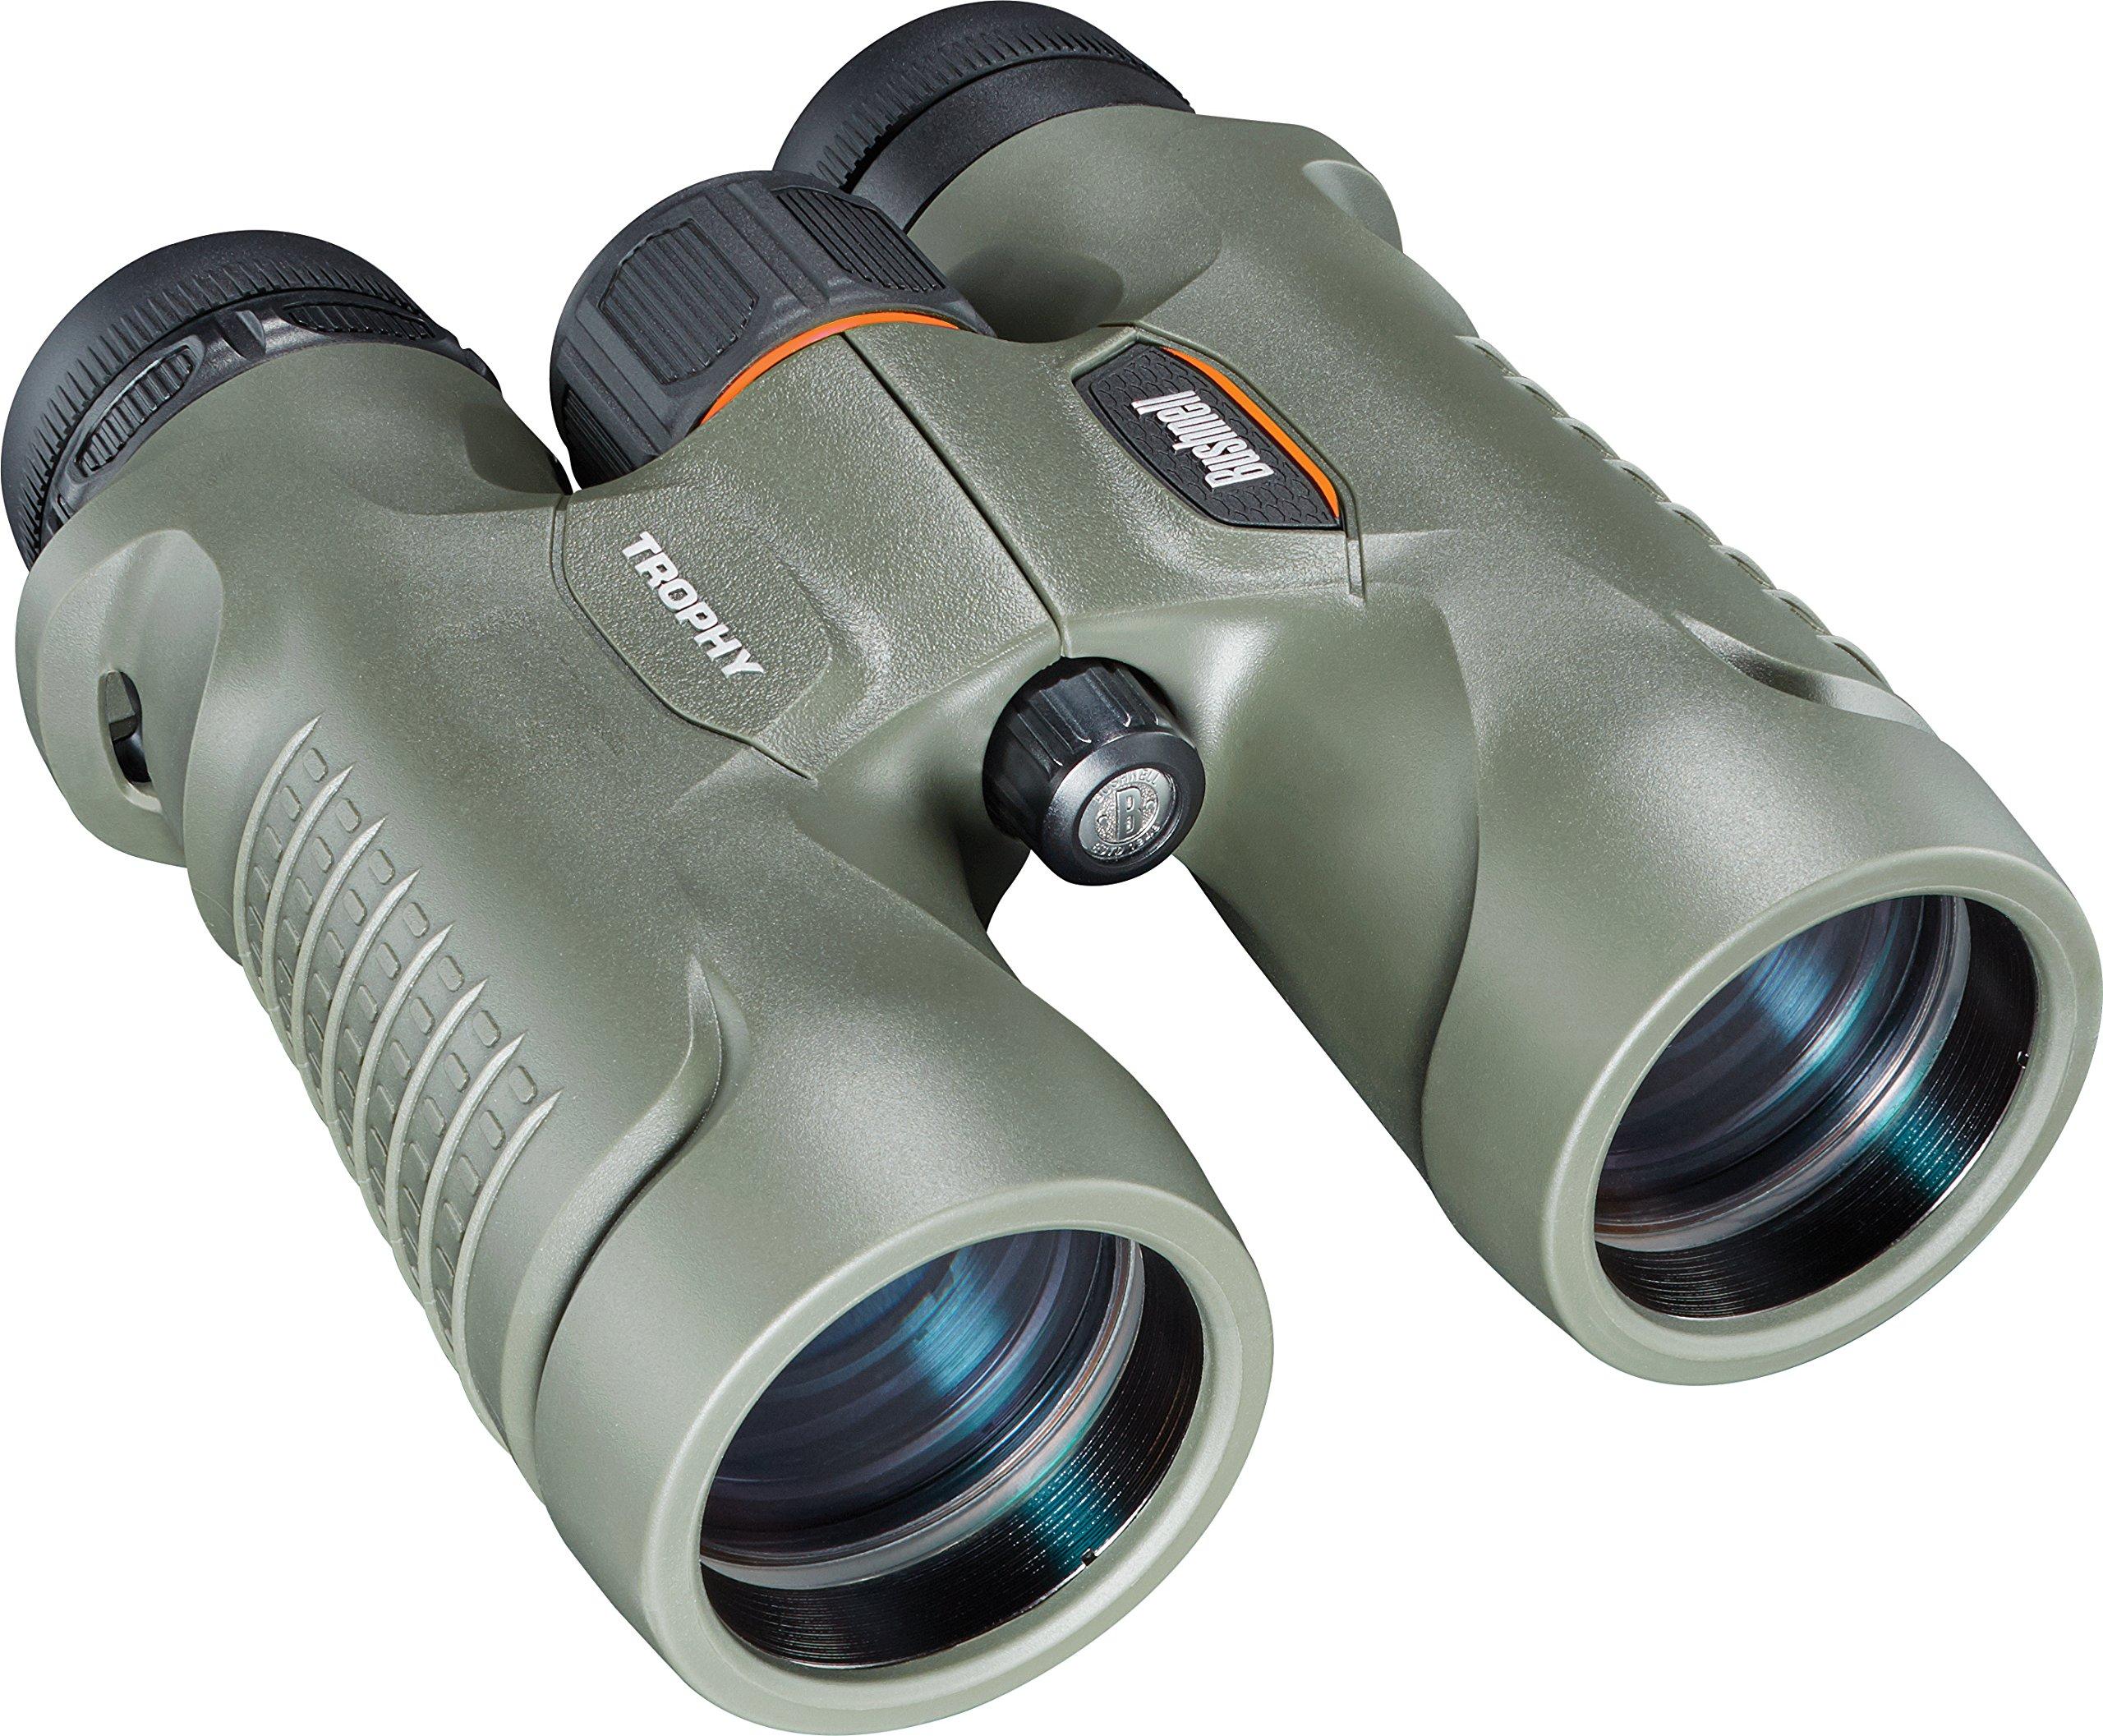 Bushnell 334212 Trophy Binocular, Green, 10 x 42mm by Bushnell